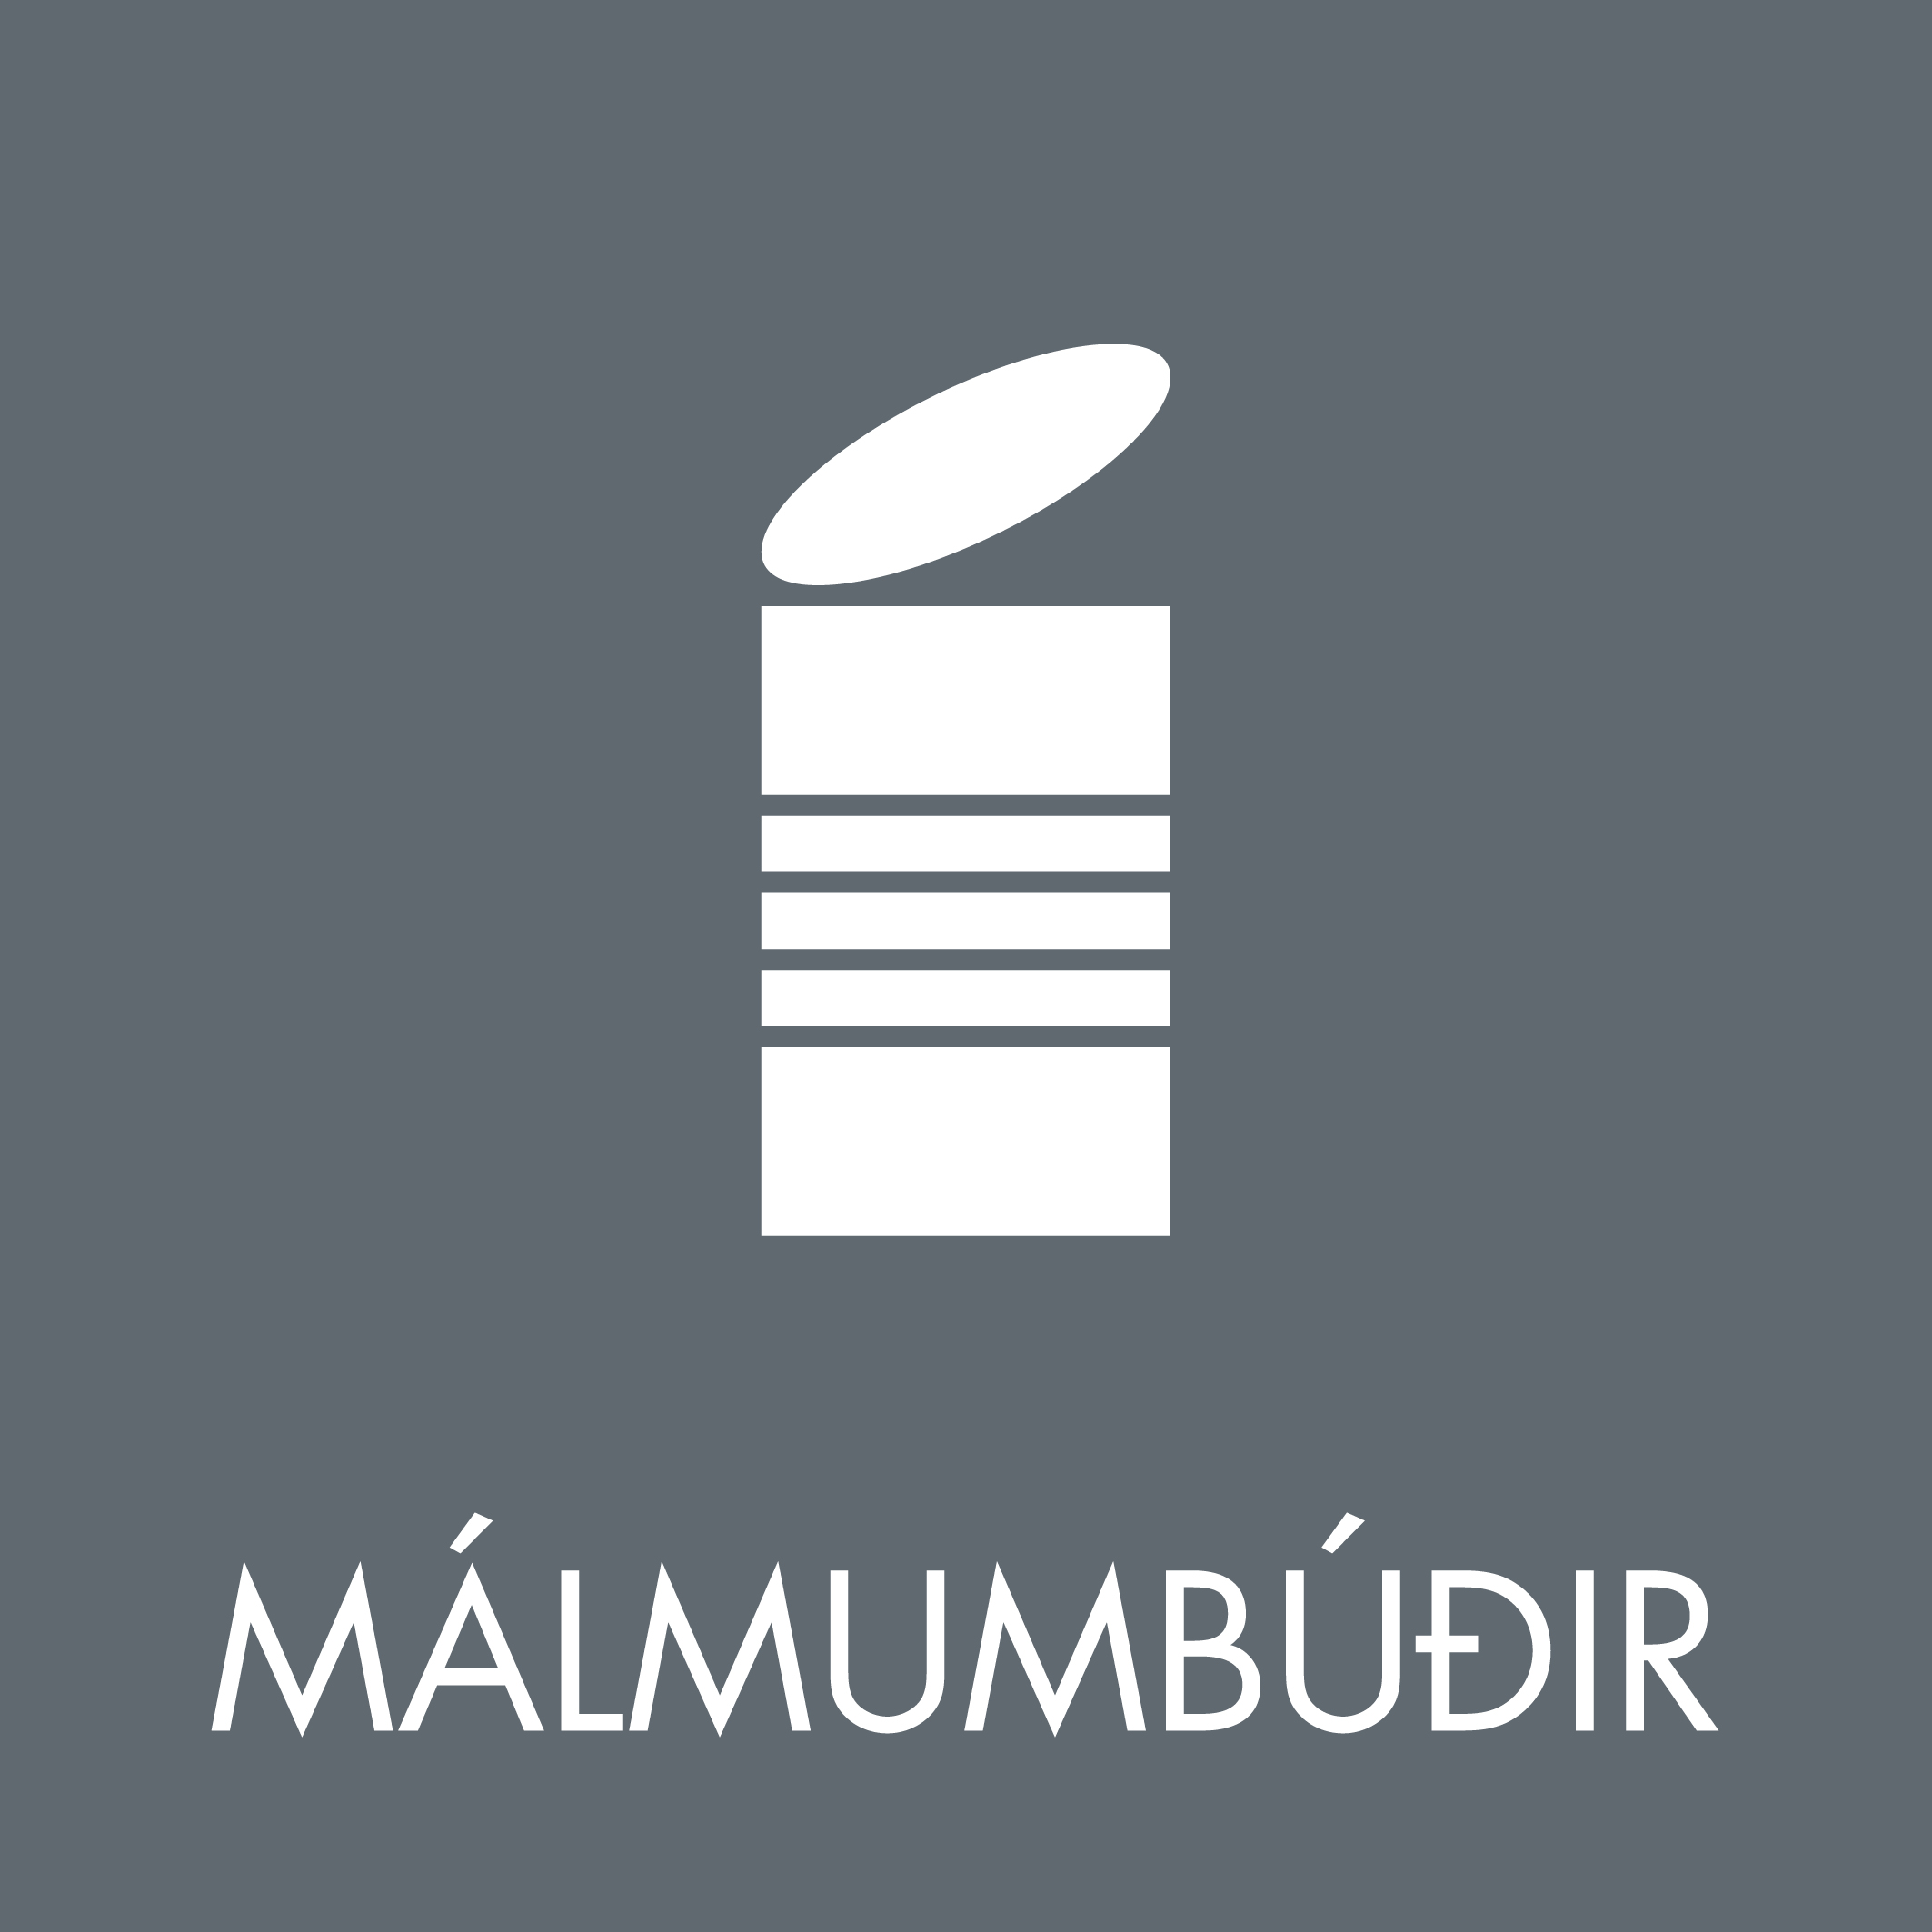 Málmumbúðir